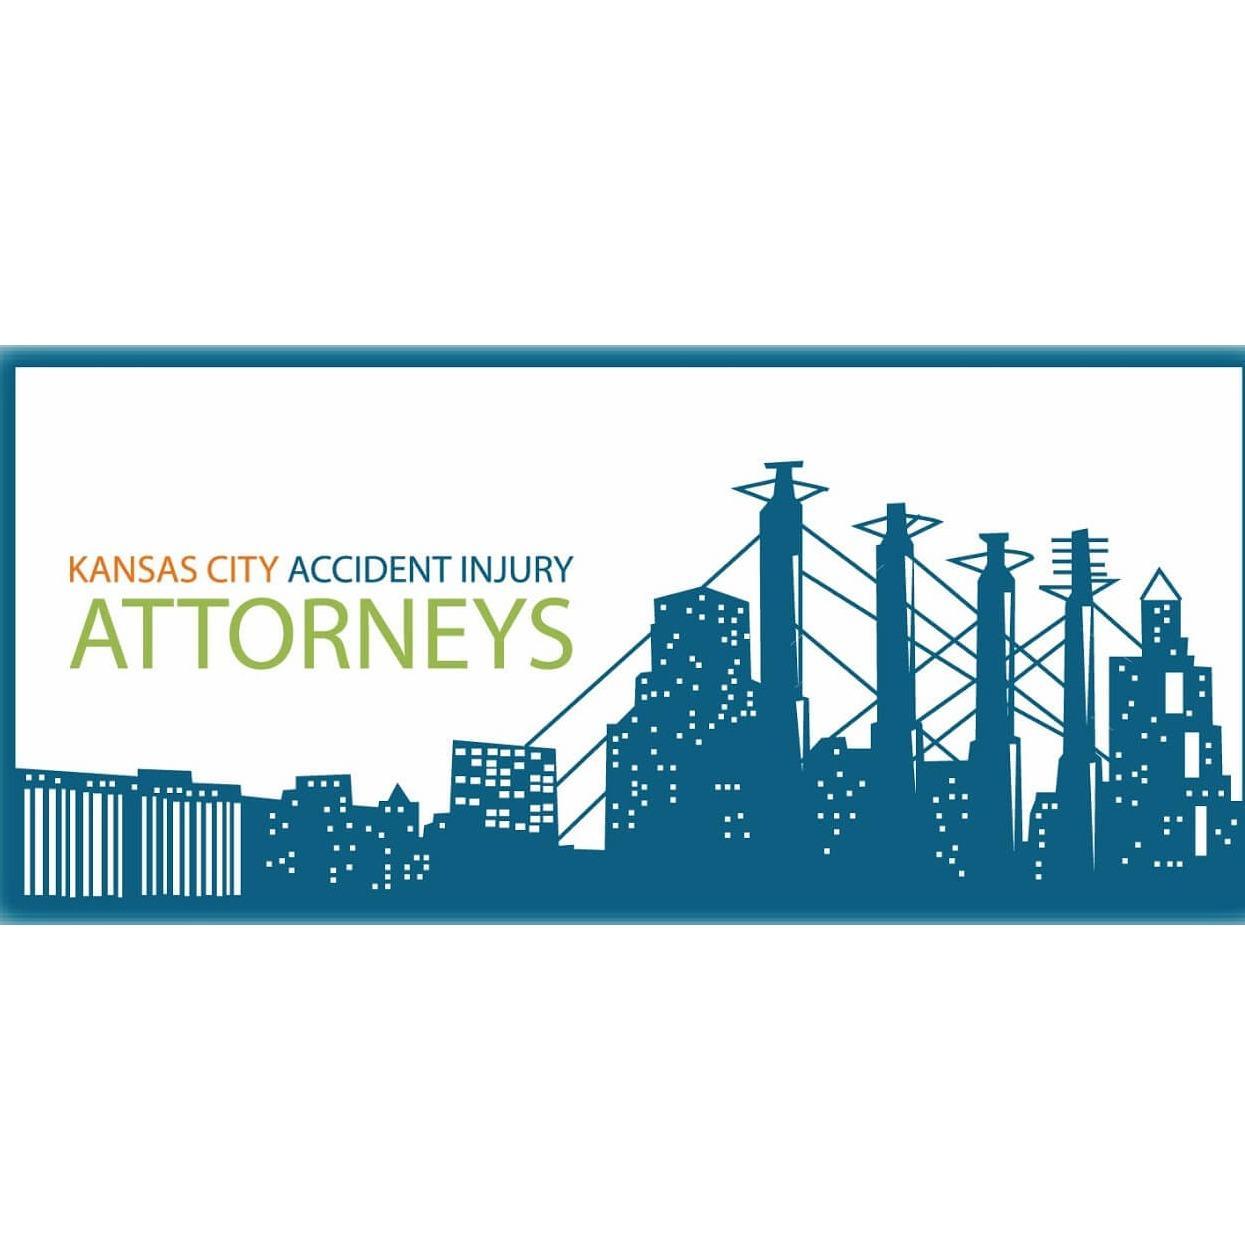 Kansas City Accident Injury Attorneys